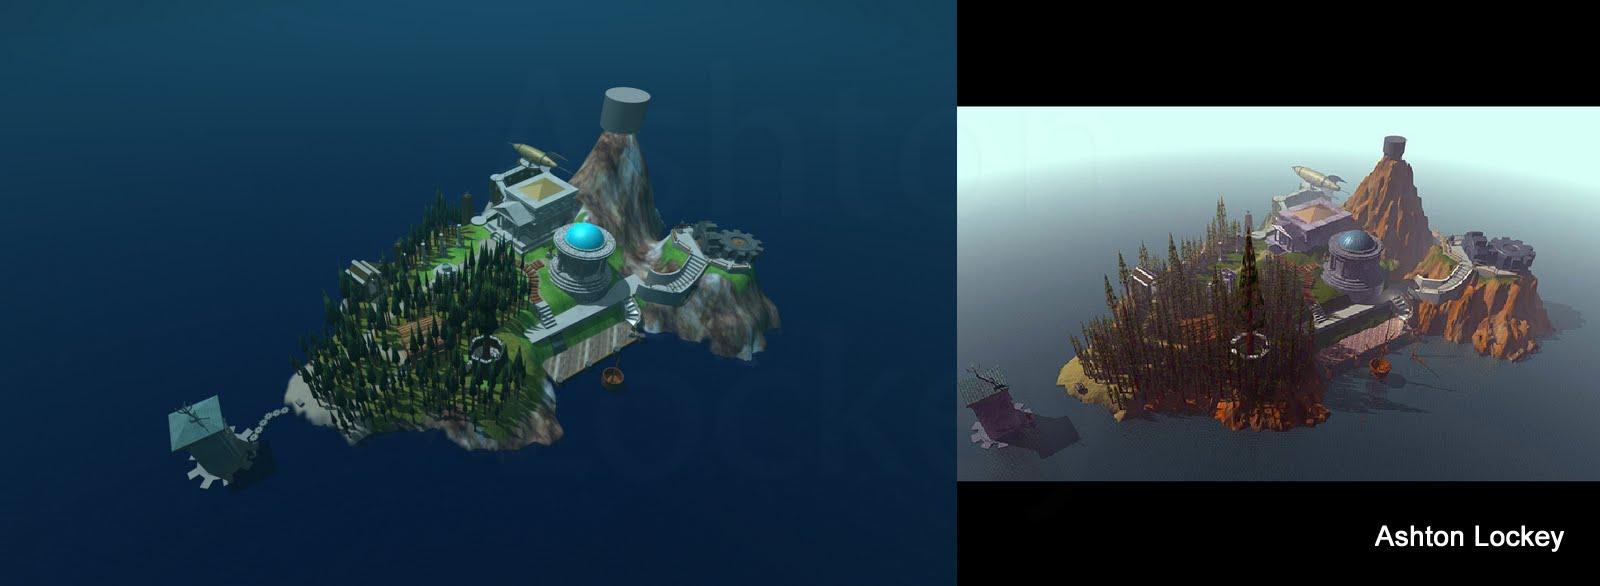 Myst Island Hd Comparison By Piththeexplorer On Deviantart